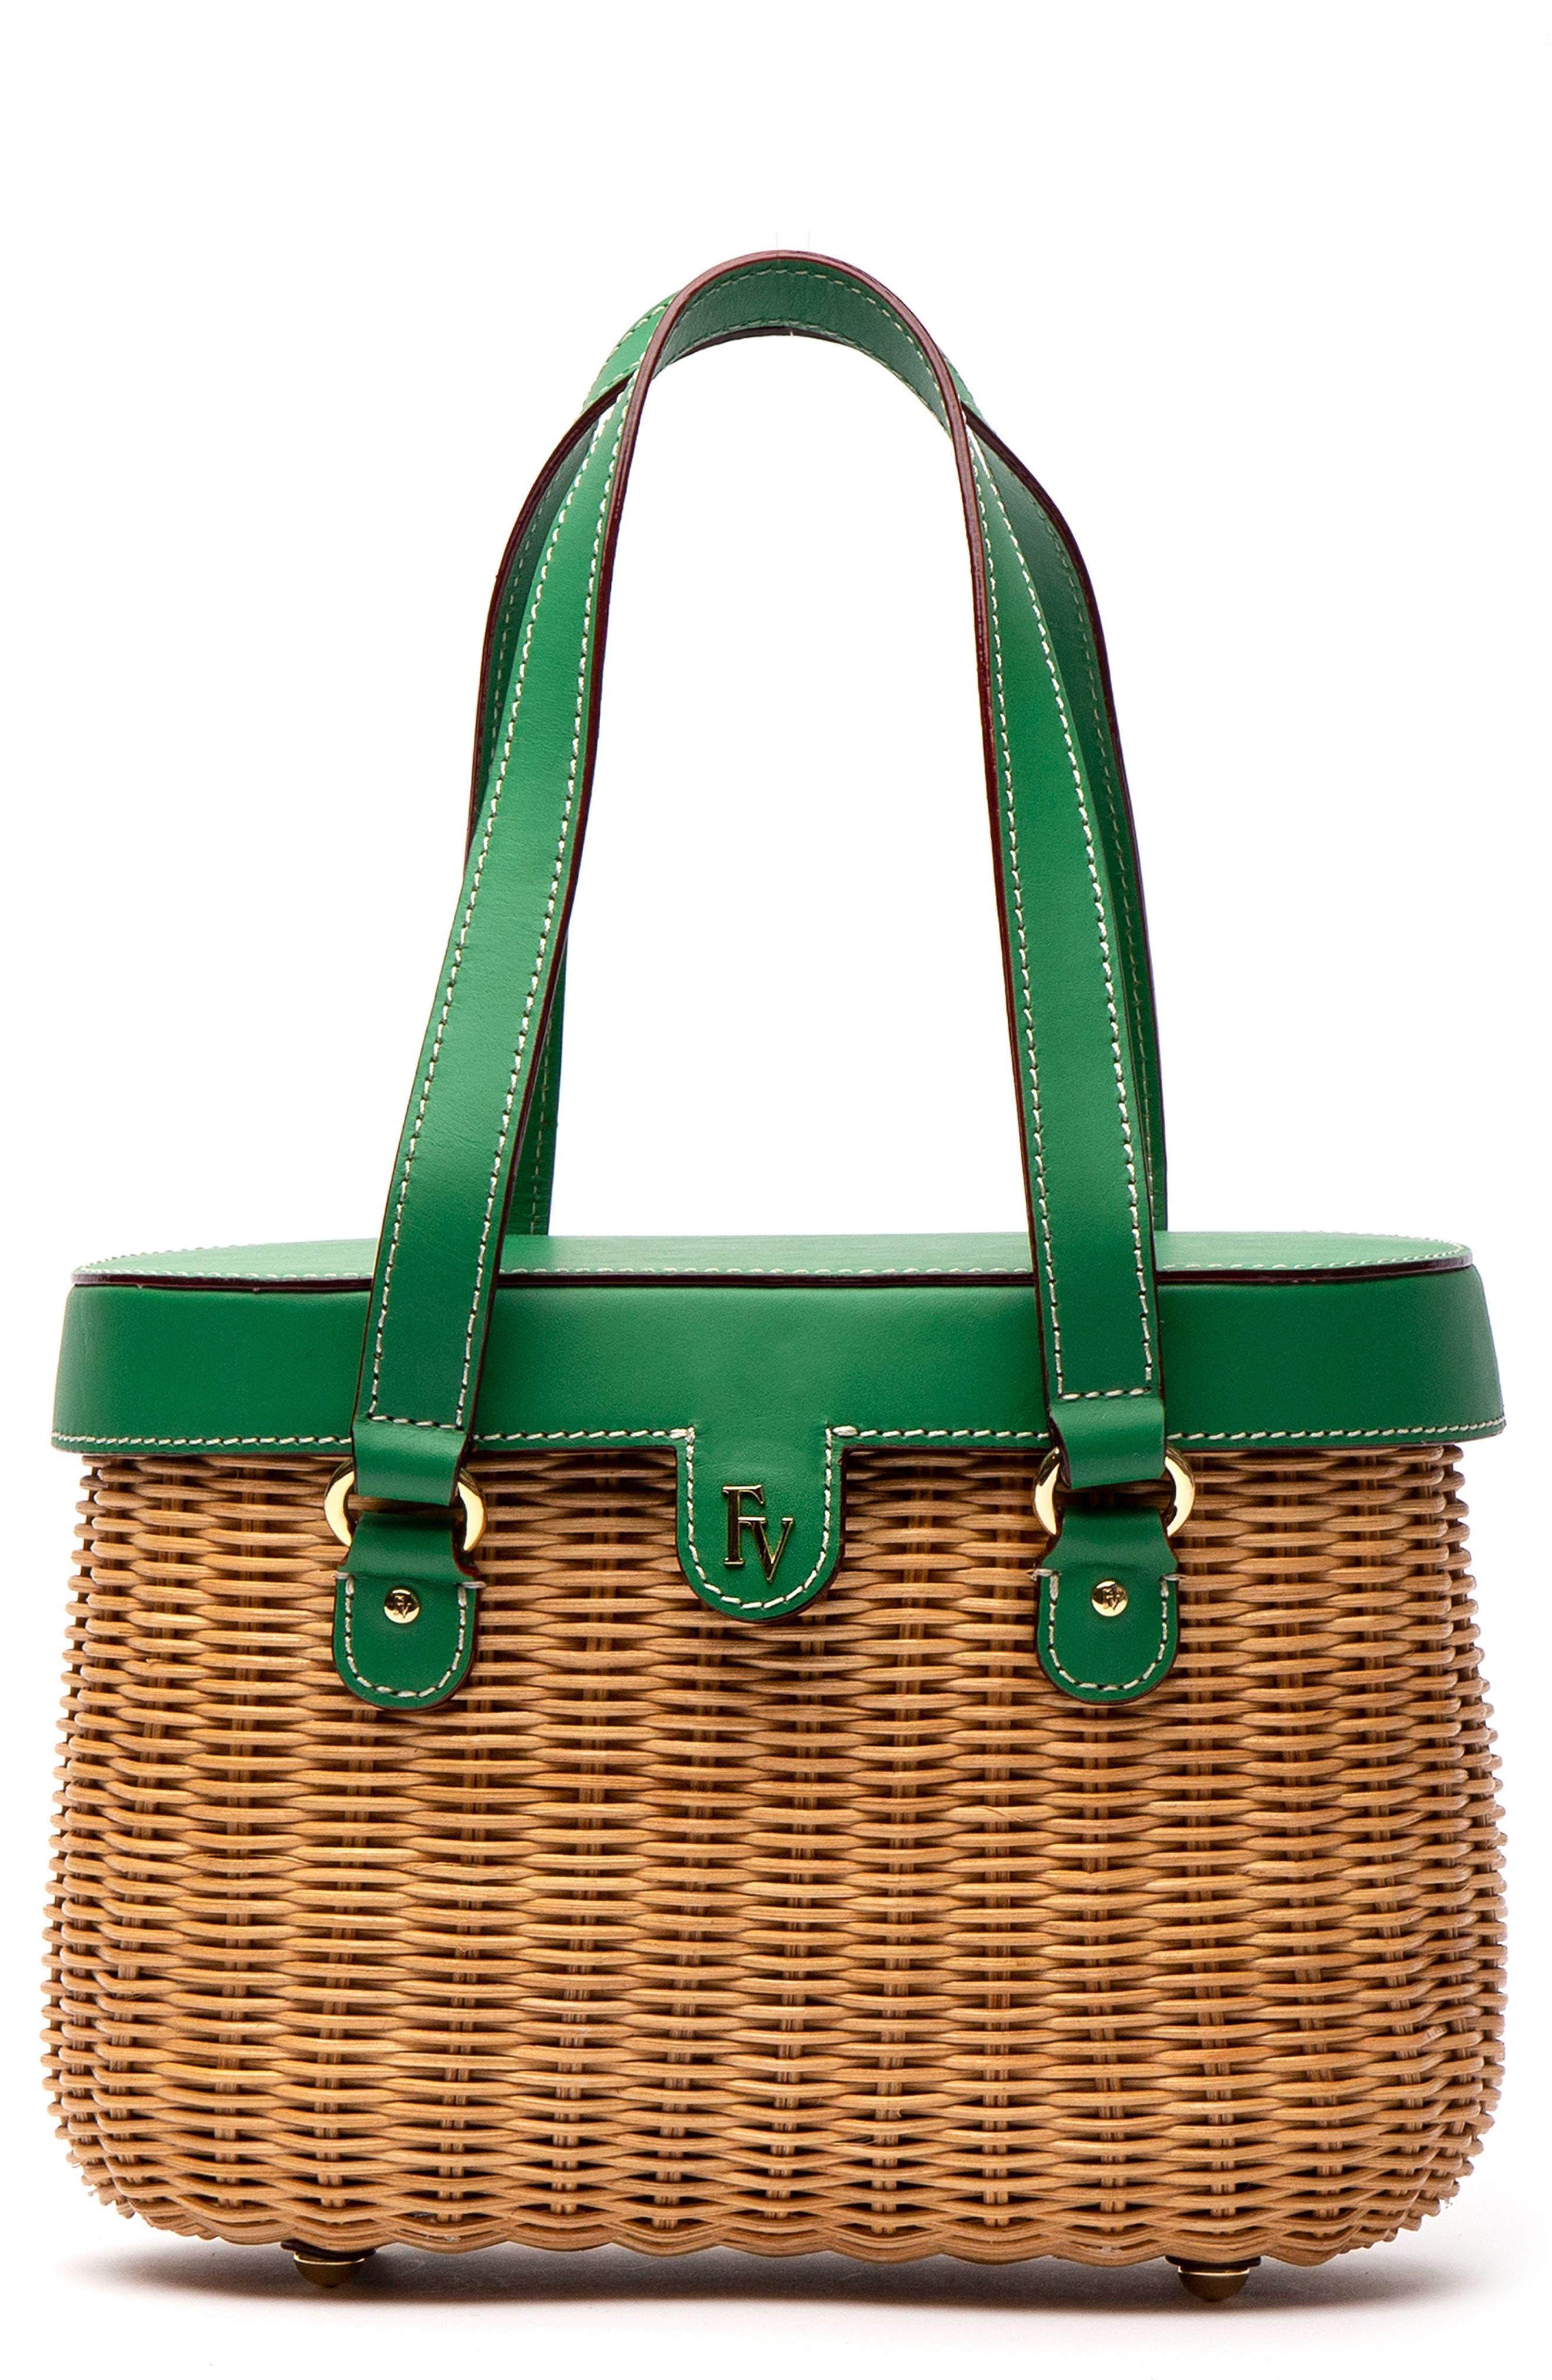 2c18bbcfa Frances Valentine Arielle Wicker Top Handle Bag - Green